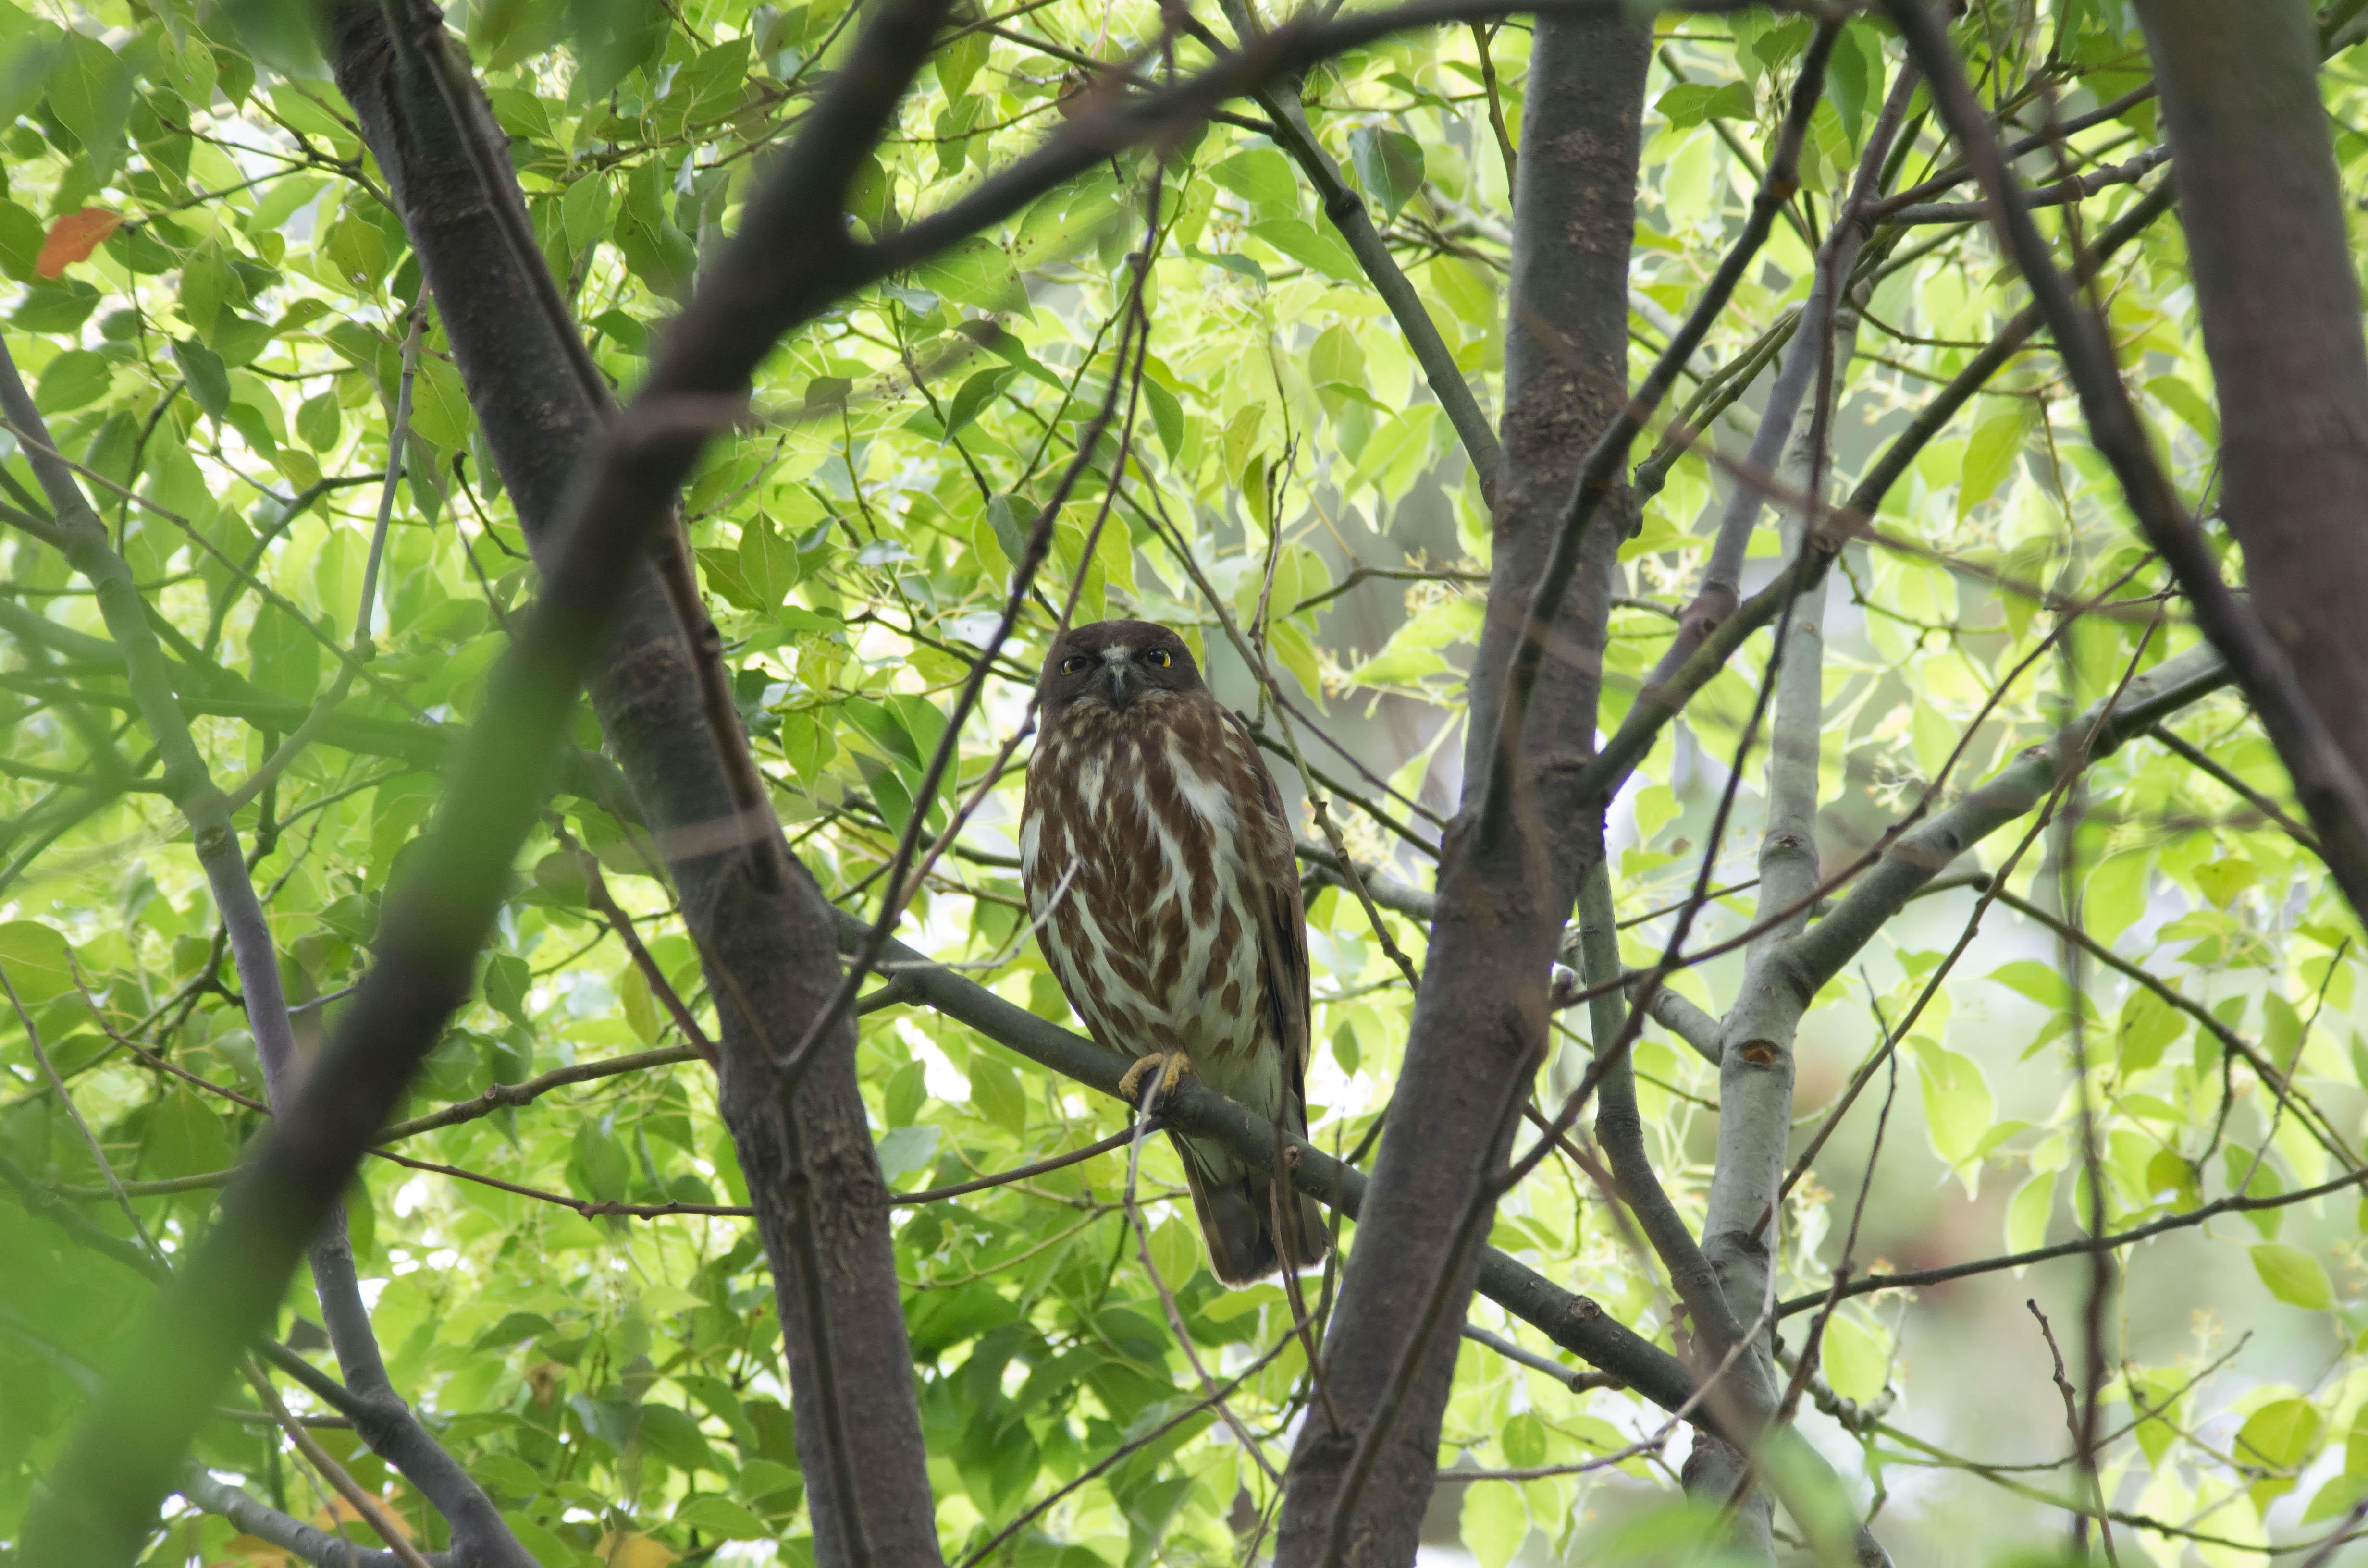 BORG71FLで撮影した野鳥・アオバヅクの写真画像